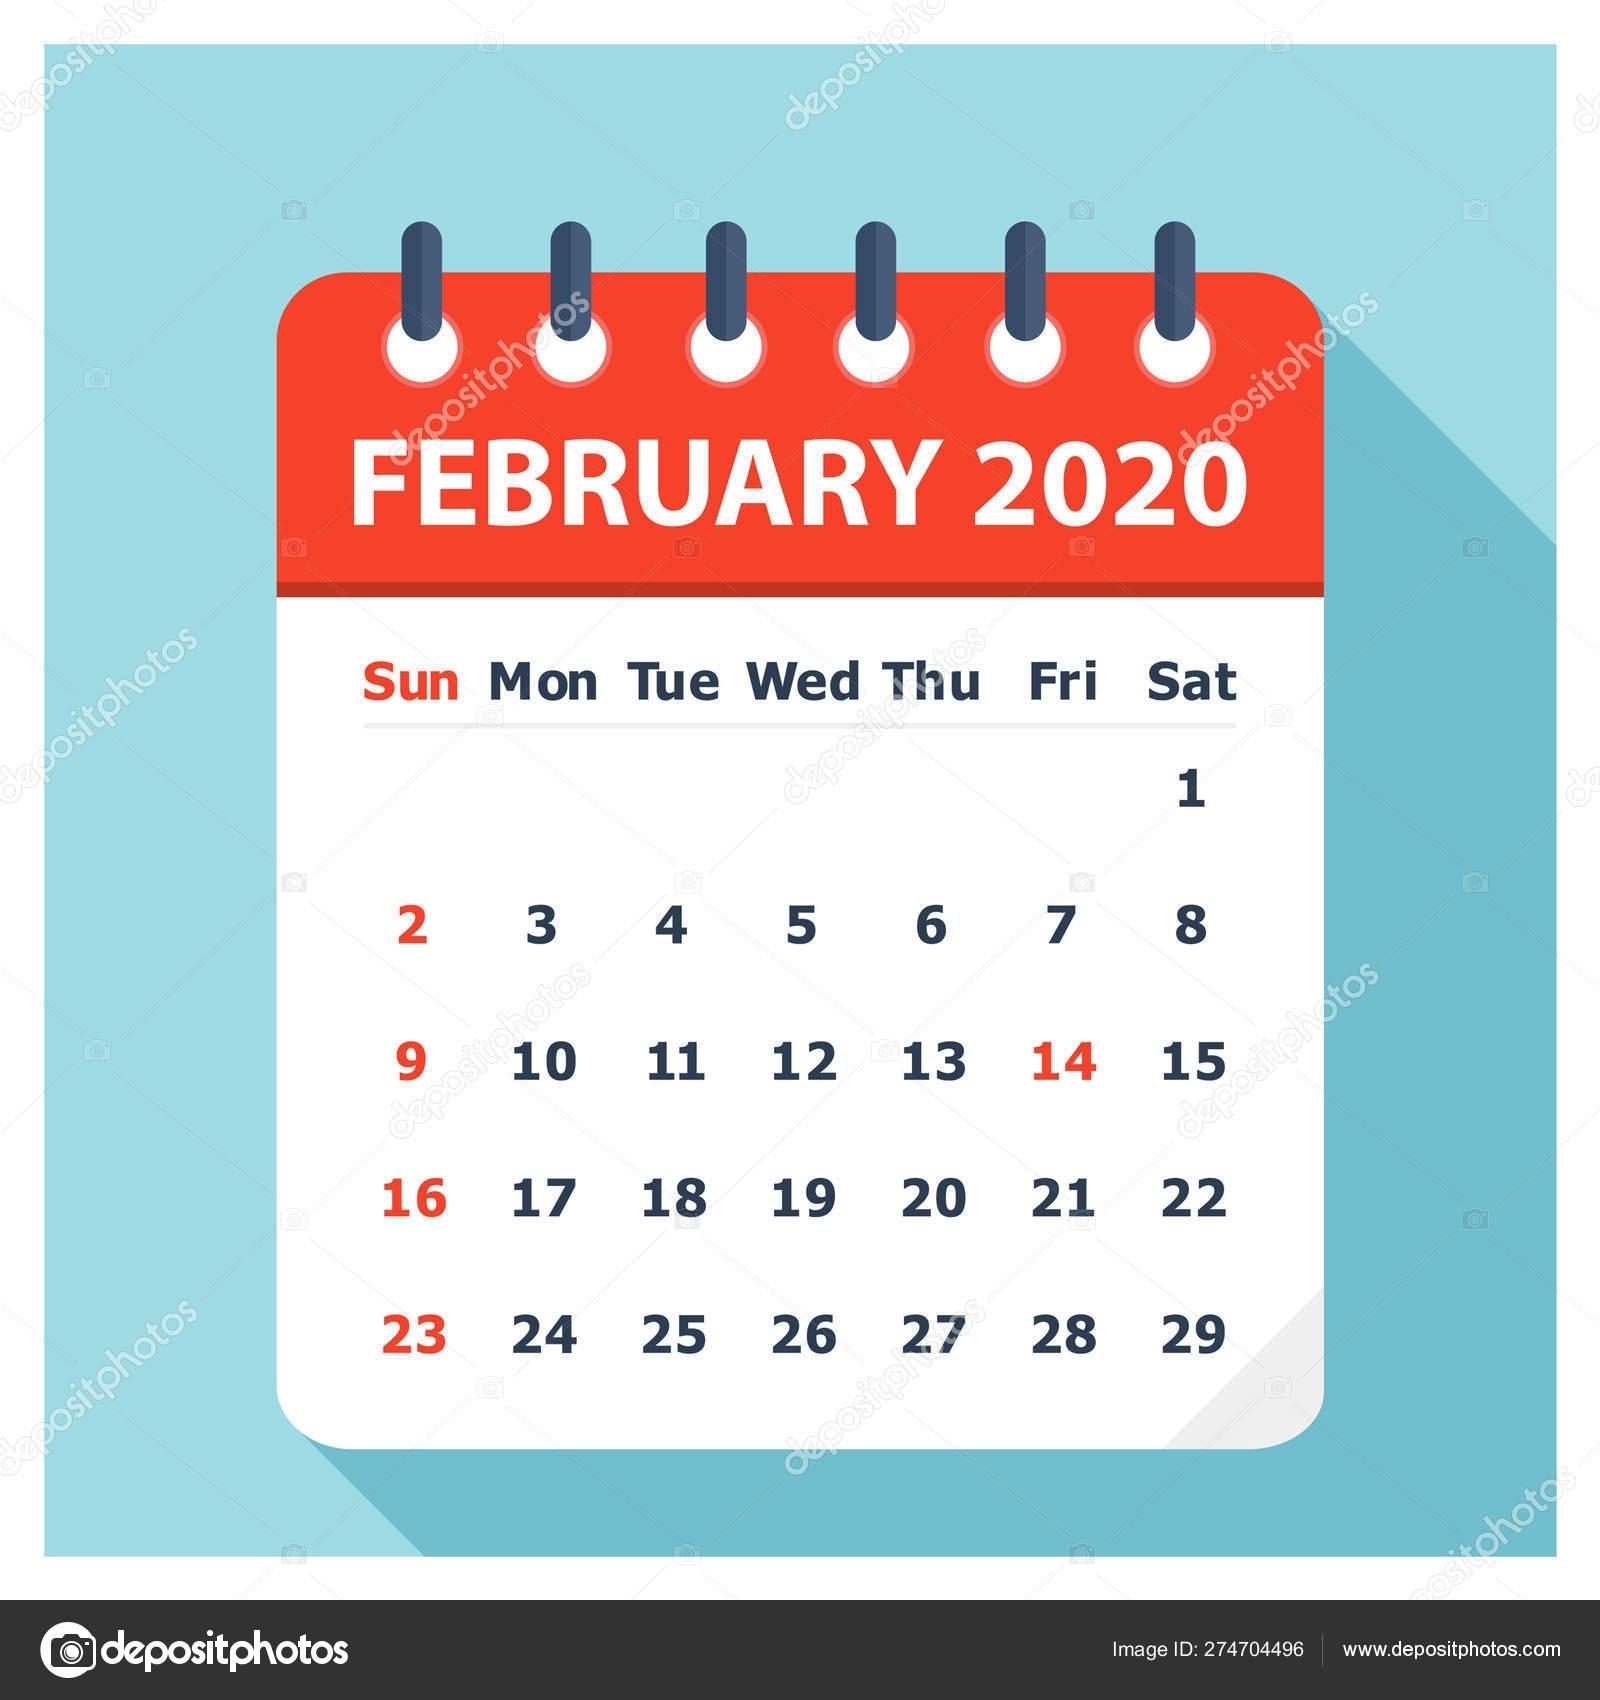 February 2020 - Calendar Icon - Calendar Design Template